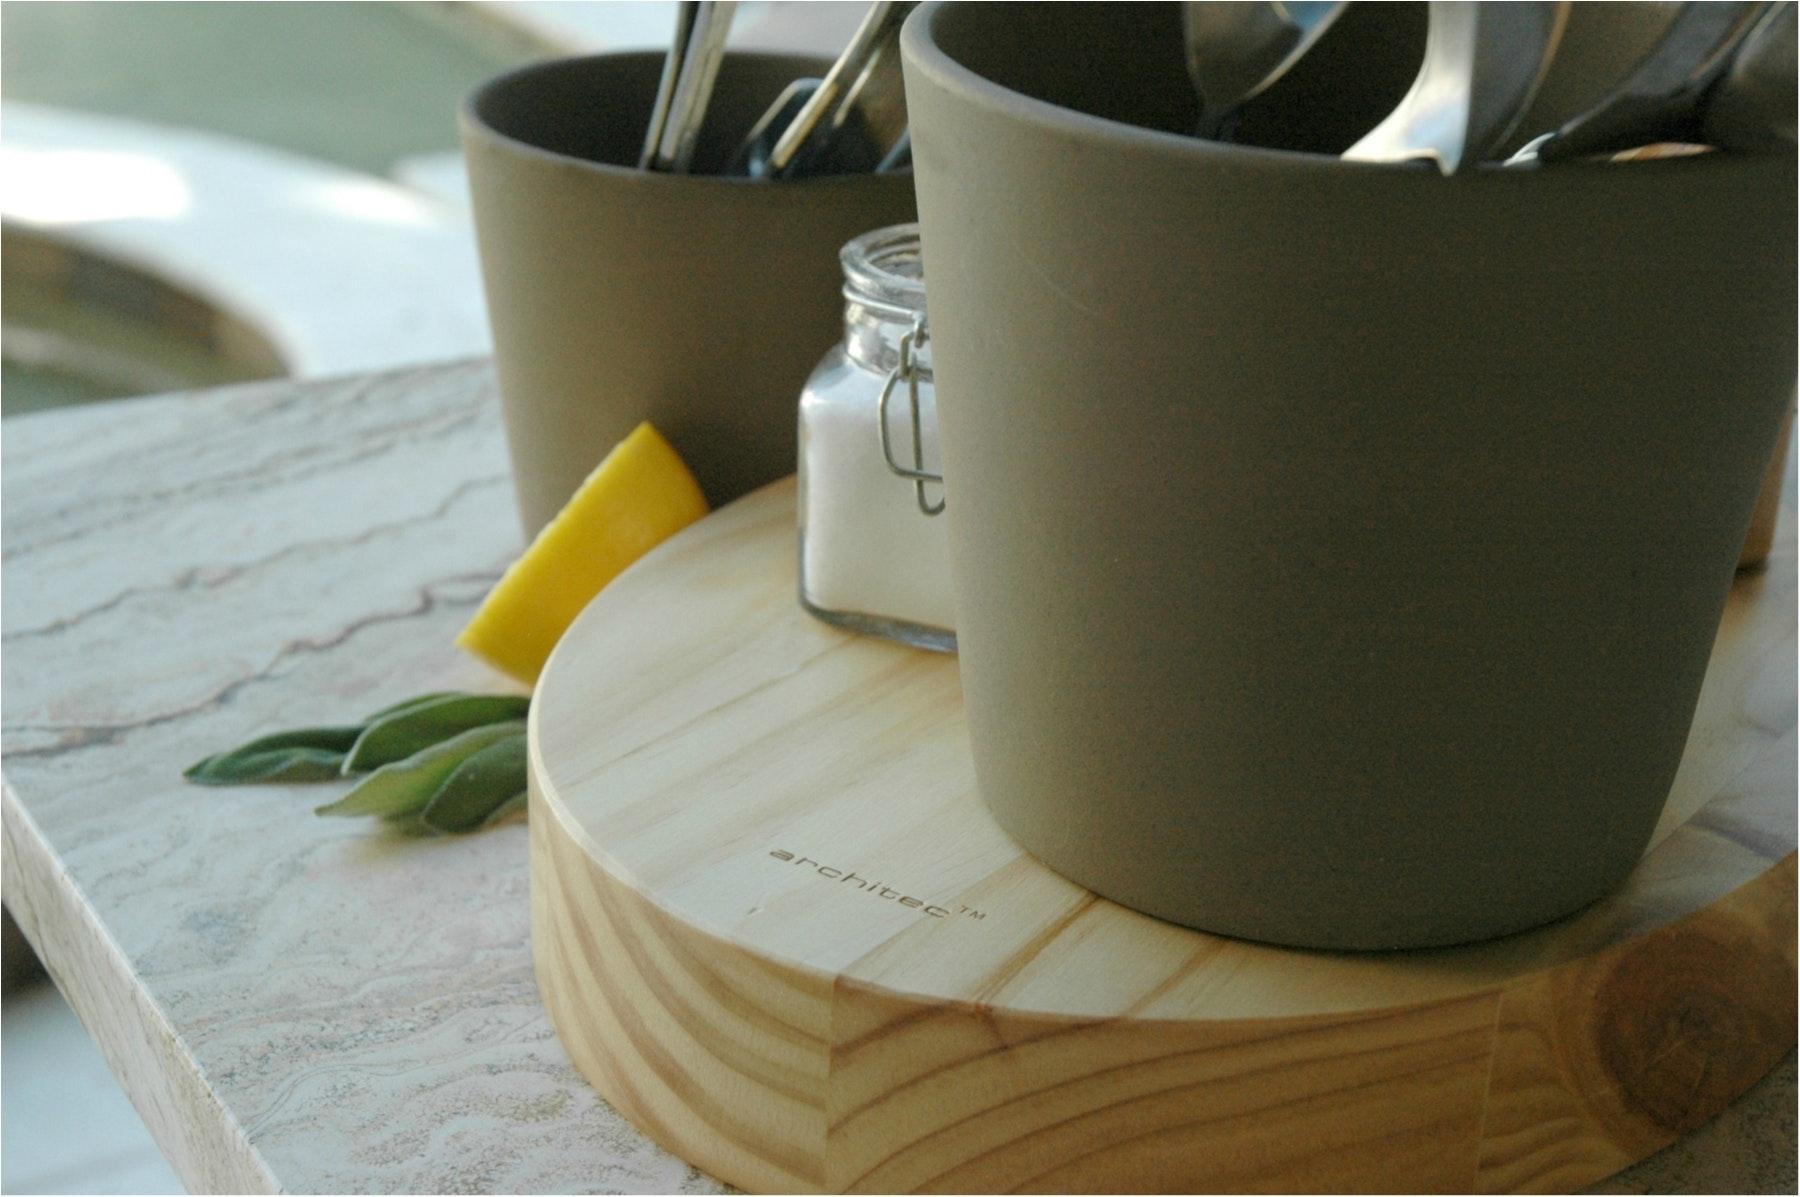 KF-IHA-Potluck-Dinner-Staub -LeCreuset -HamptonForge -LodgeCastIron -Architec -6